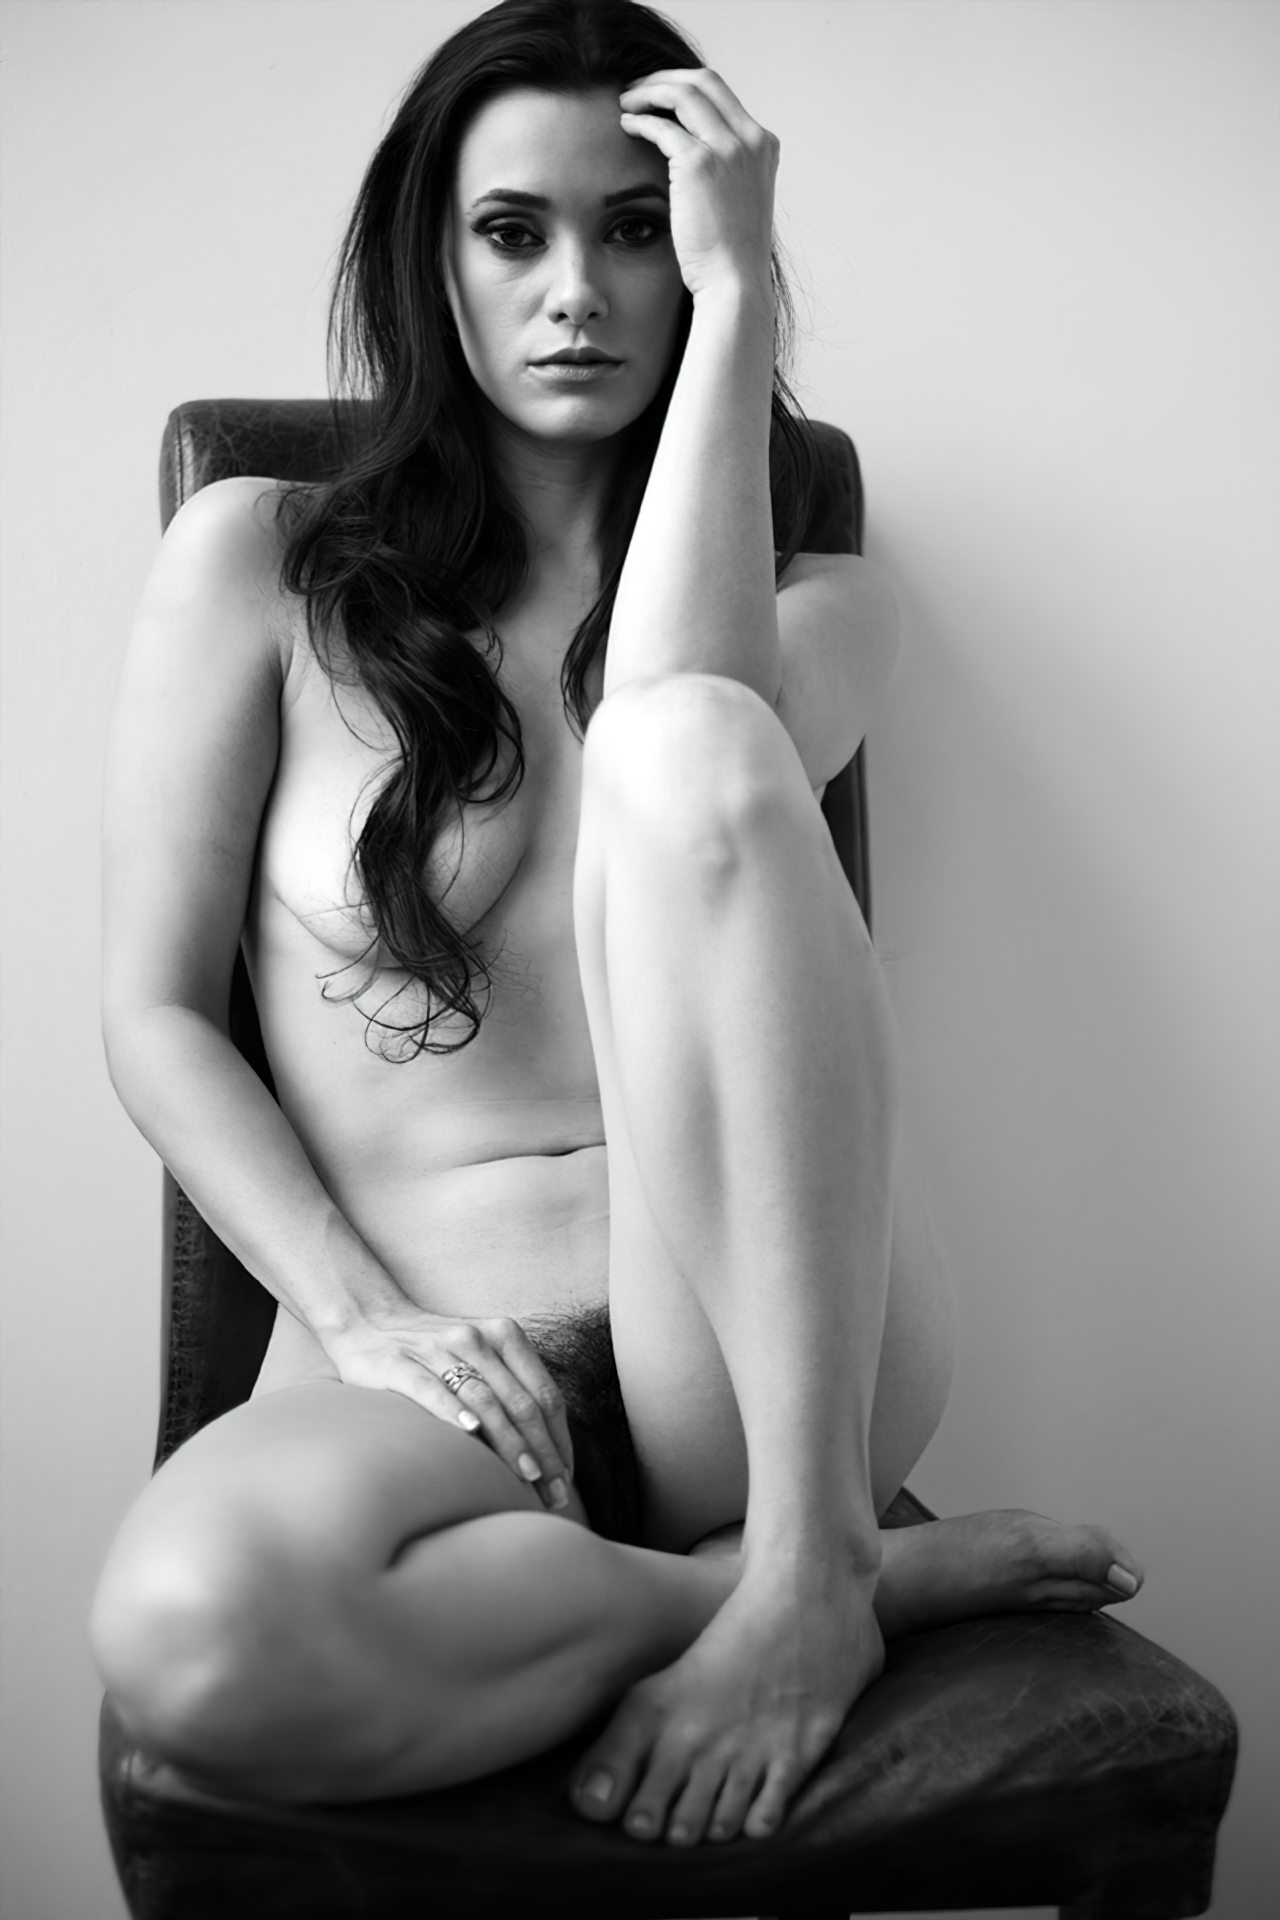 Fotos de Mulheres Nuas (30)